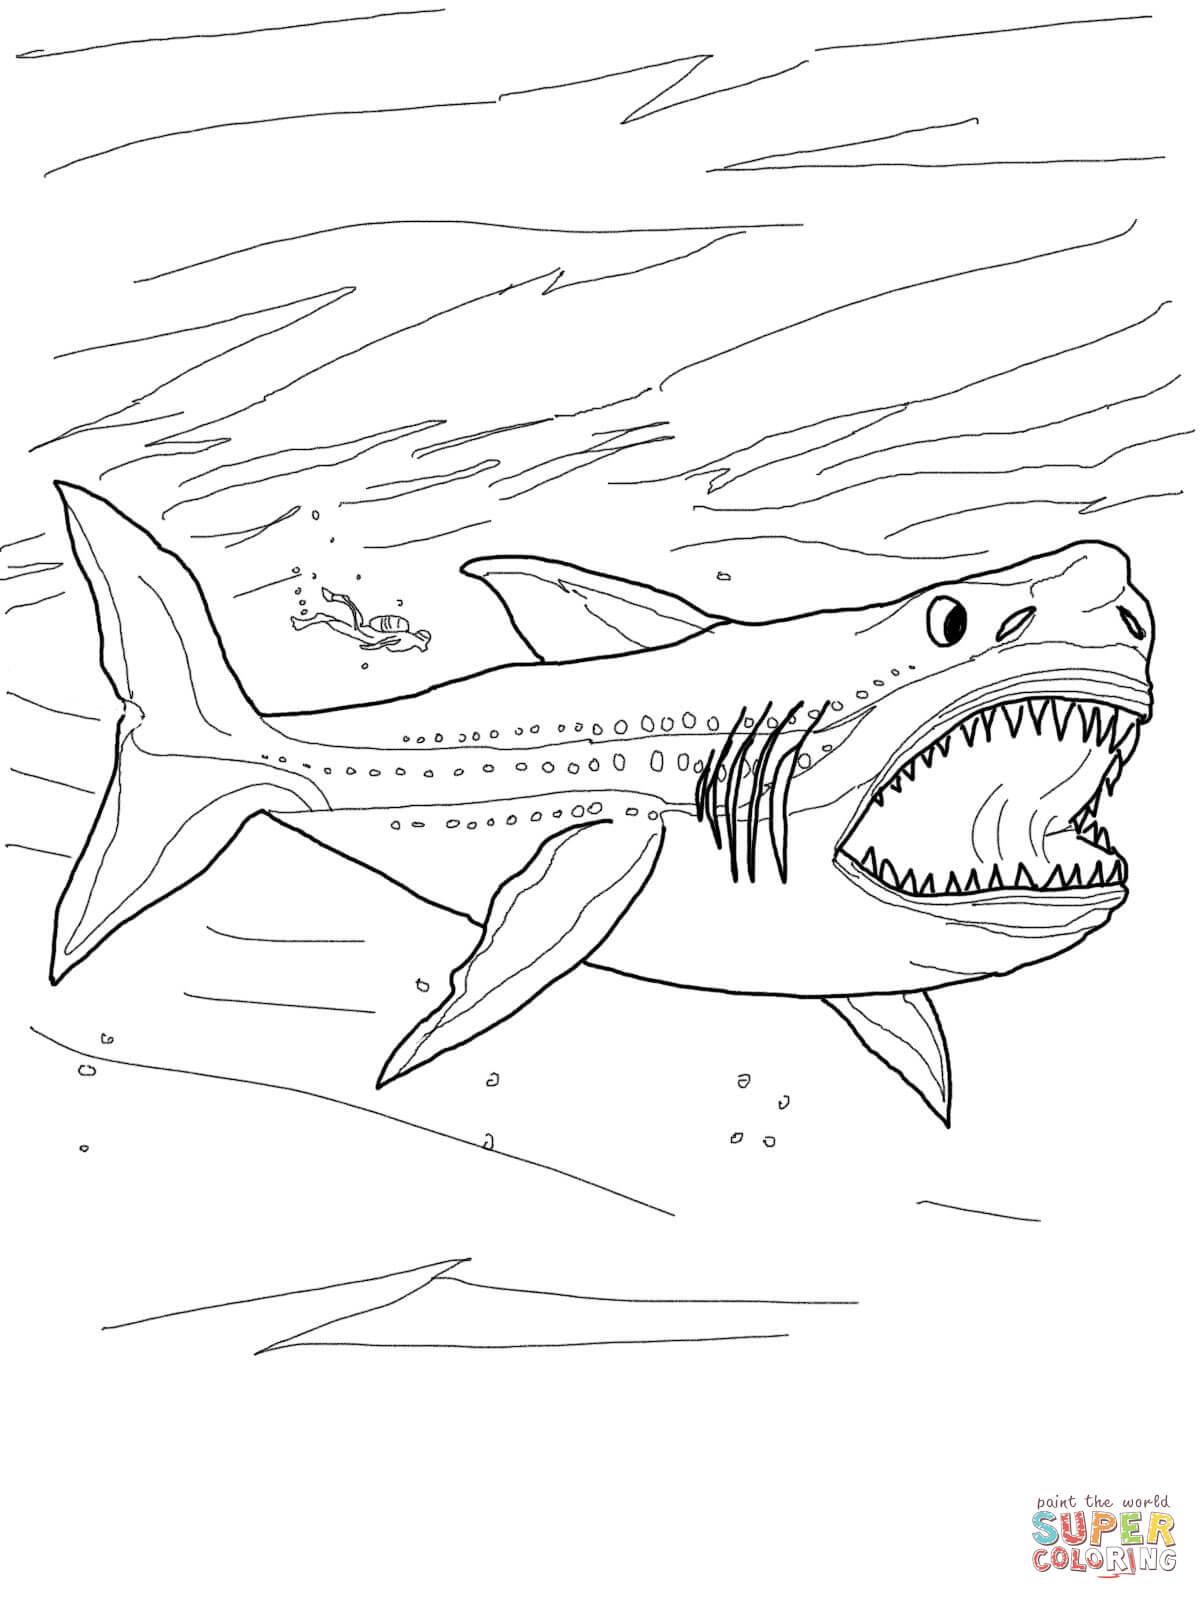 Bull Shark Drawing at GetDrawings.com   Free for personal use Bull ...